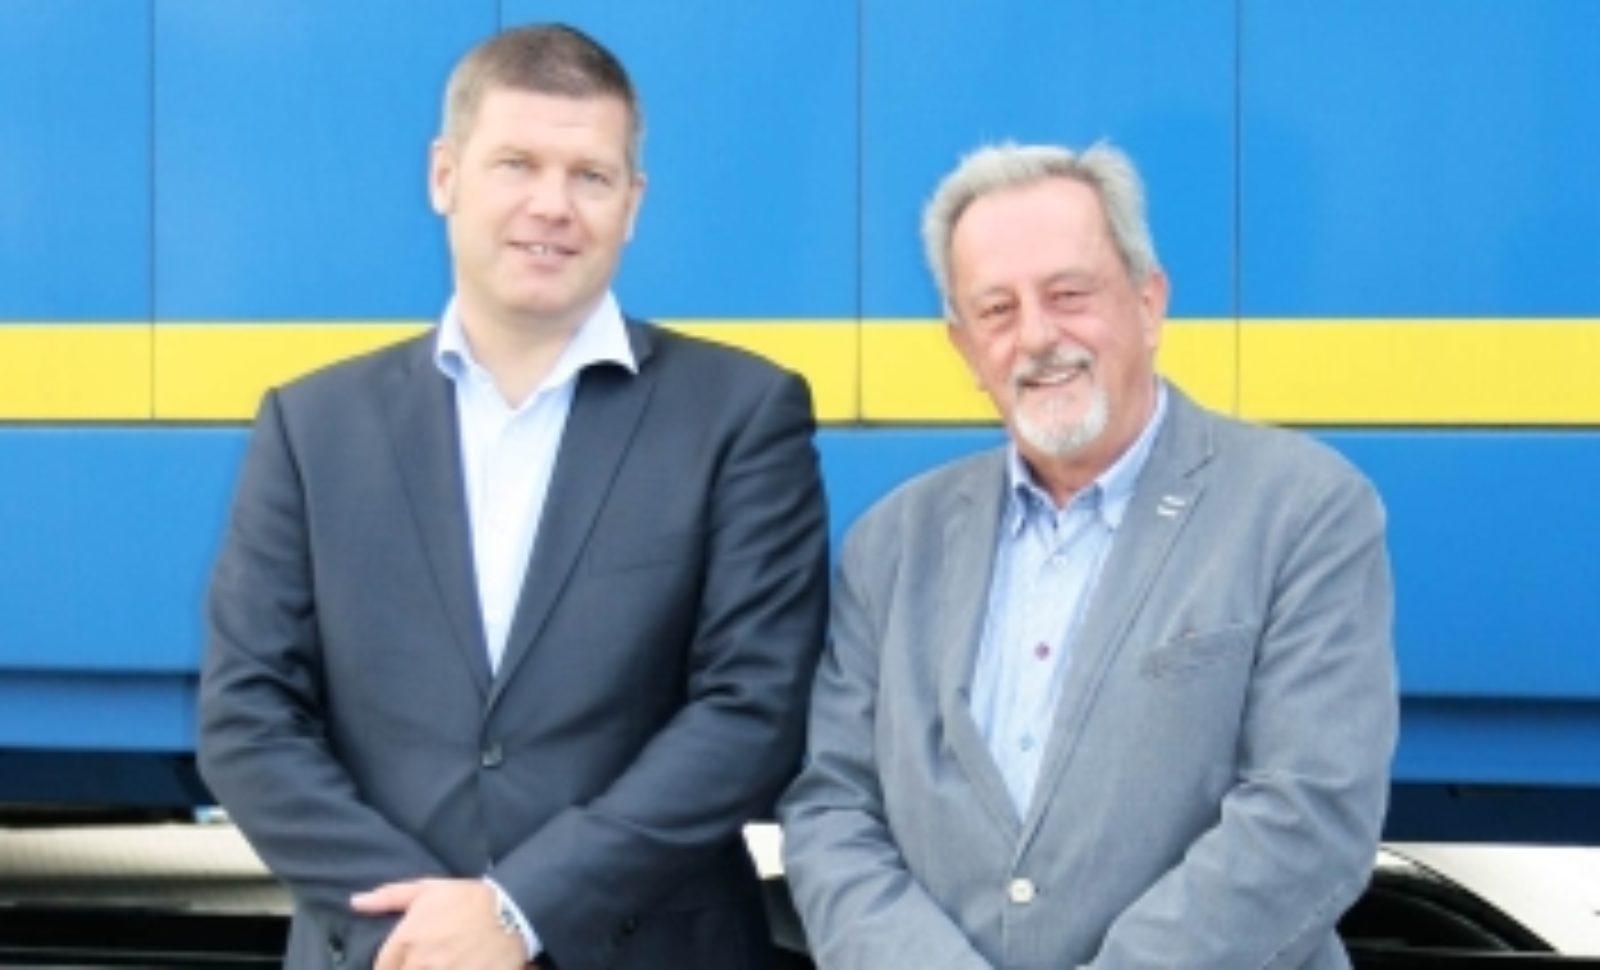 Homtrans-Geschäftsführer Gerold Claus geht in den Ruhestand